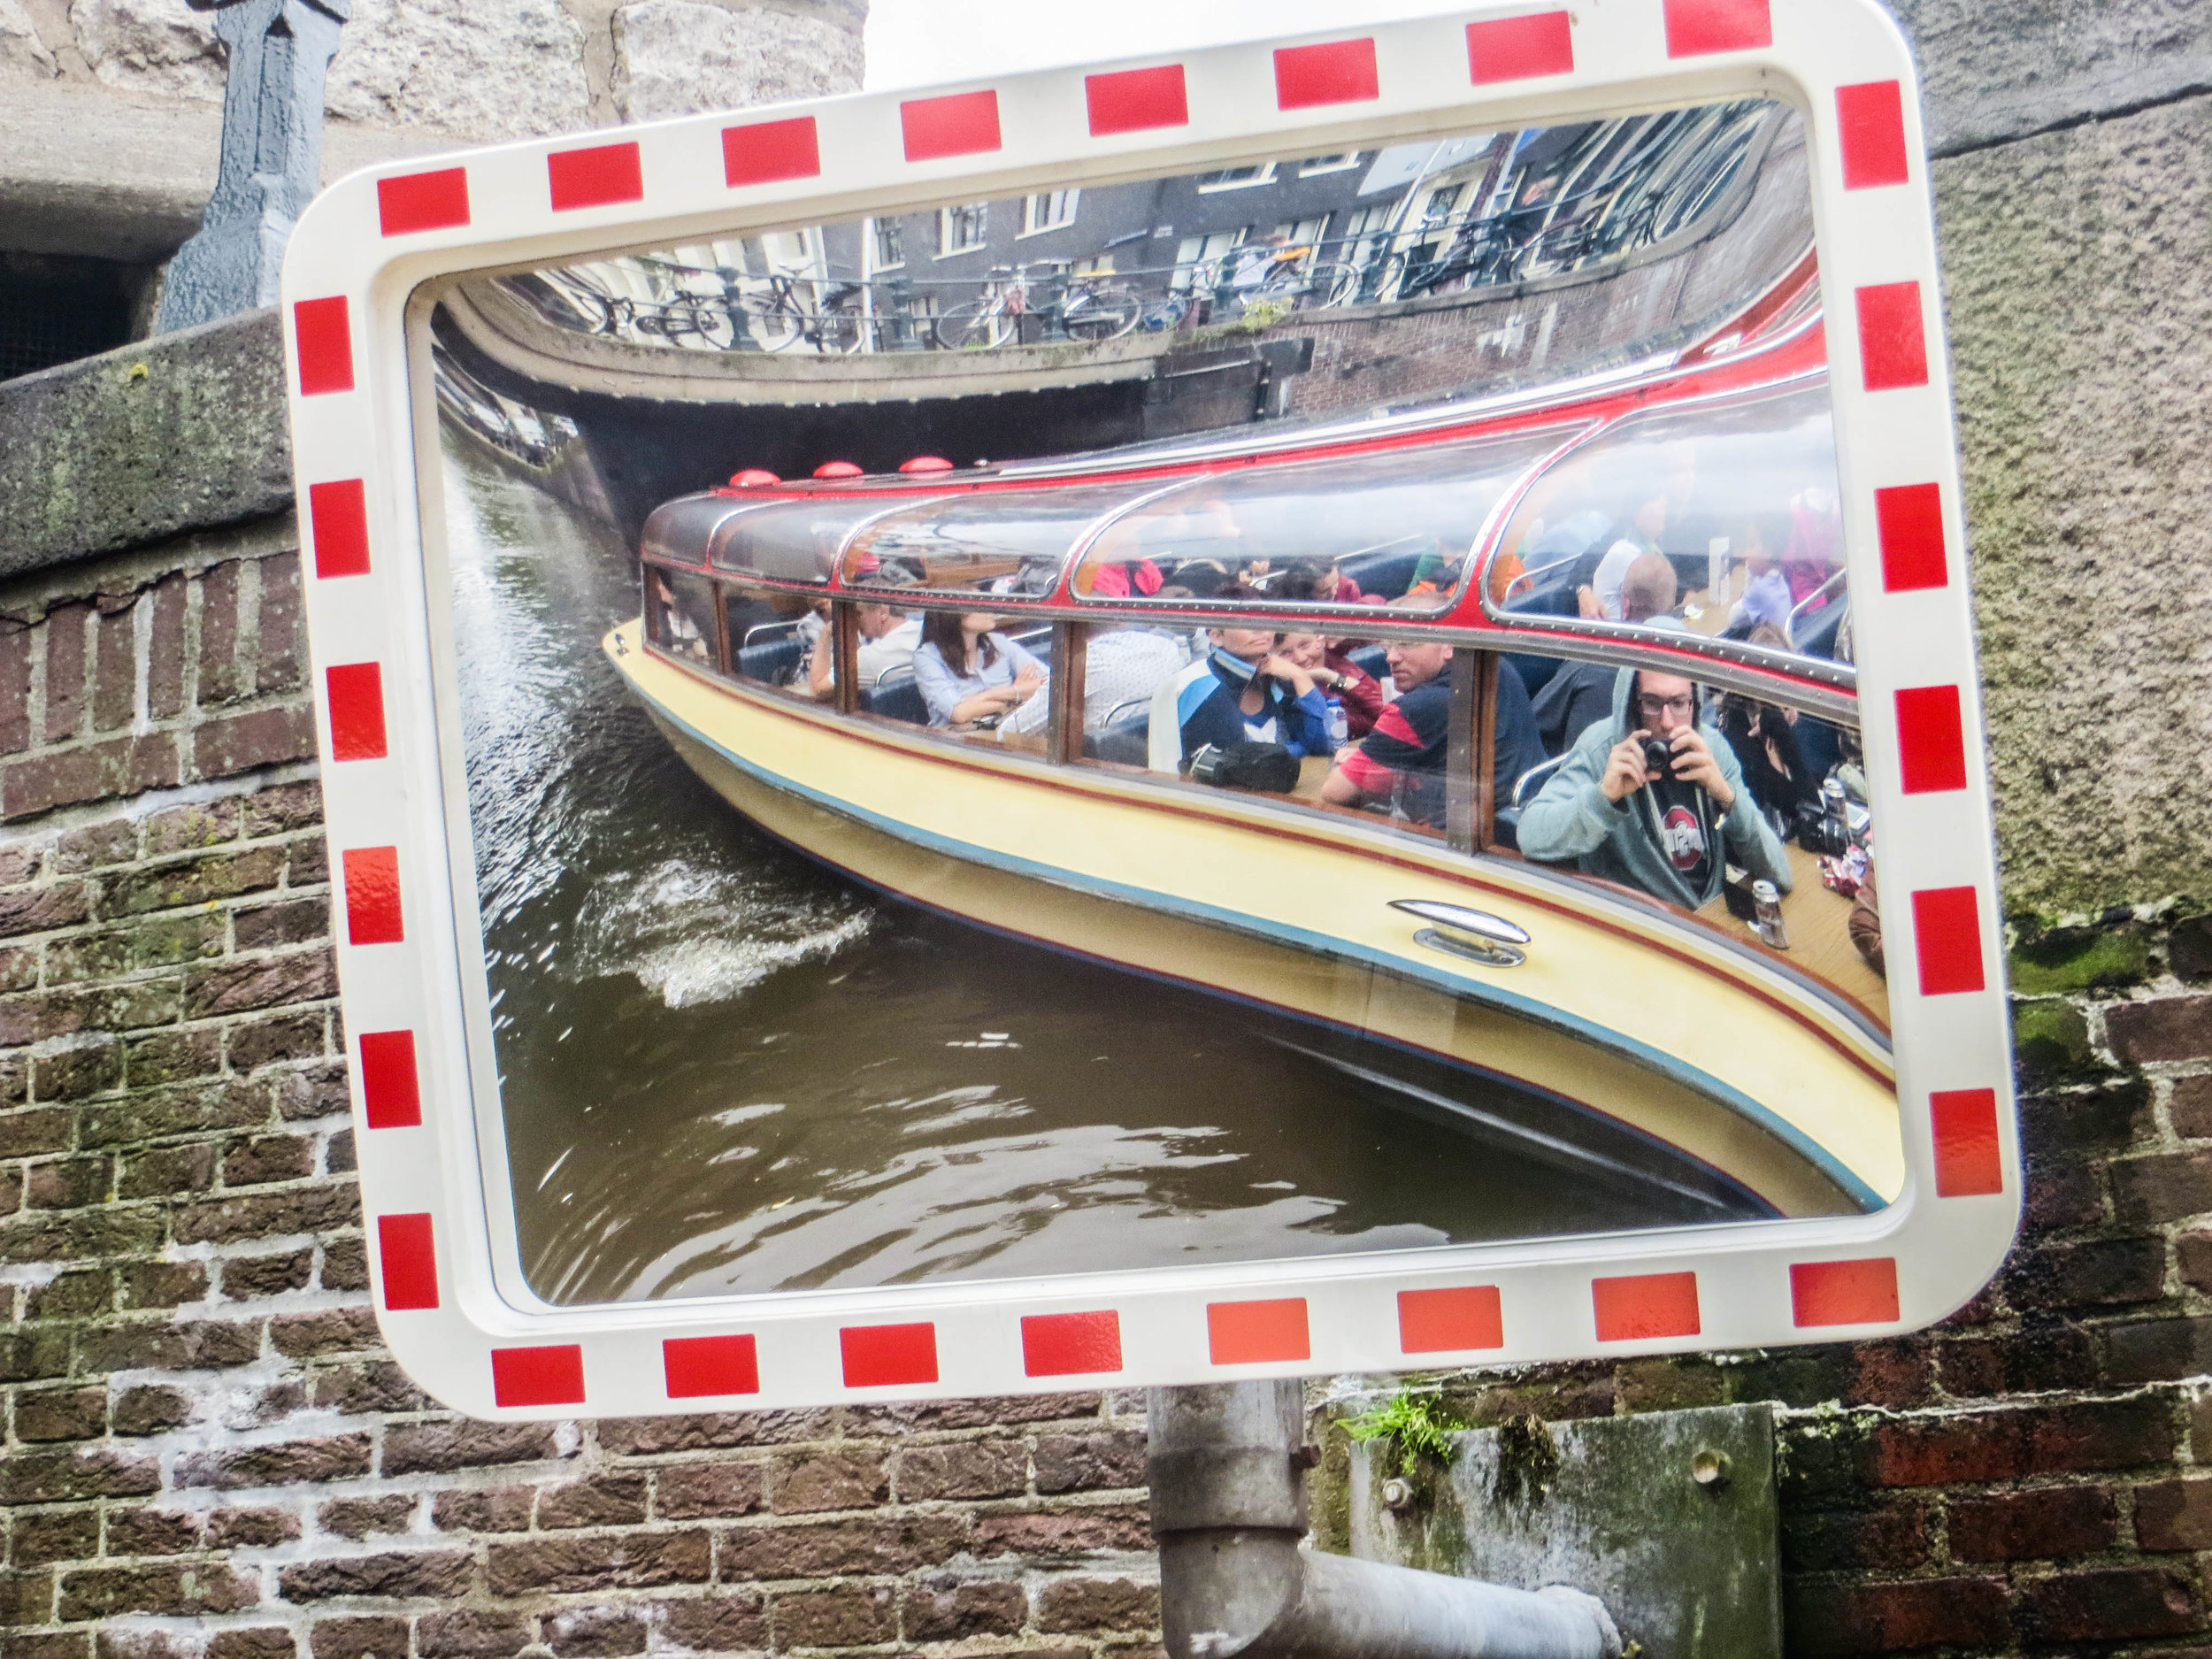 amsterdam-netherlands-street-photography-10.jpg